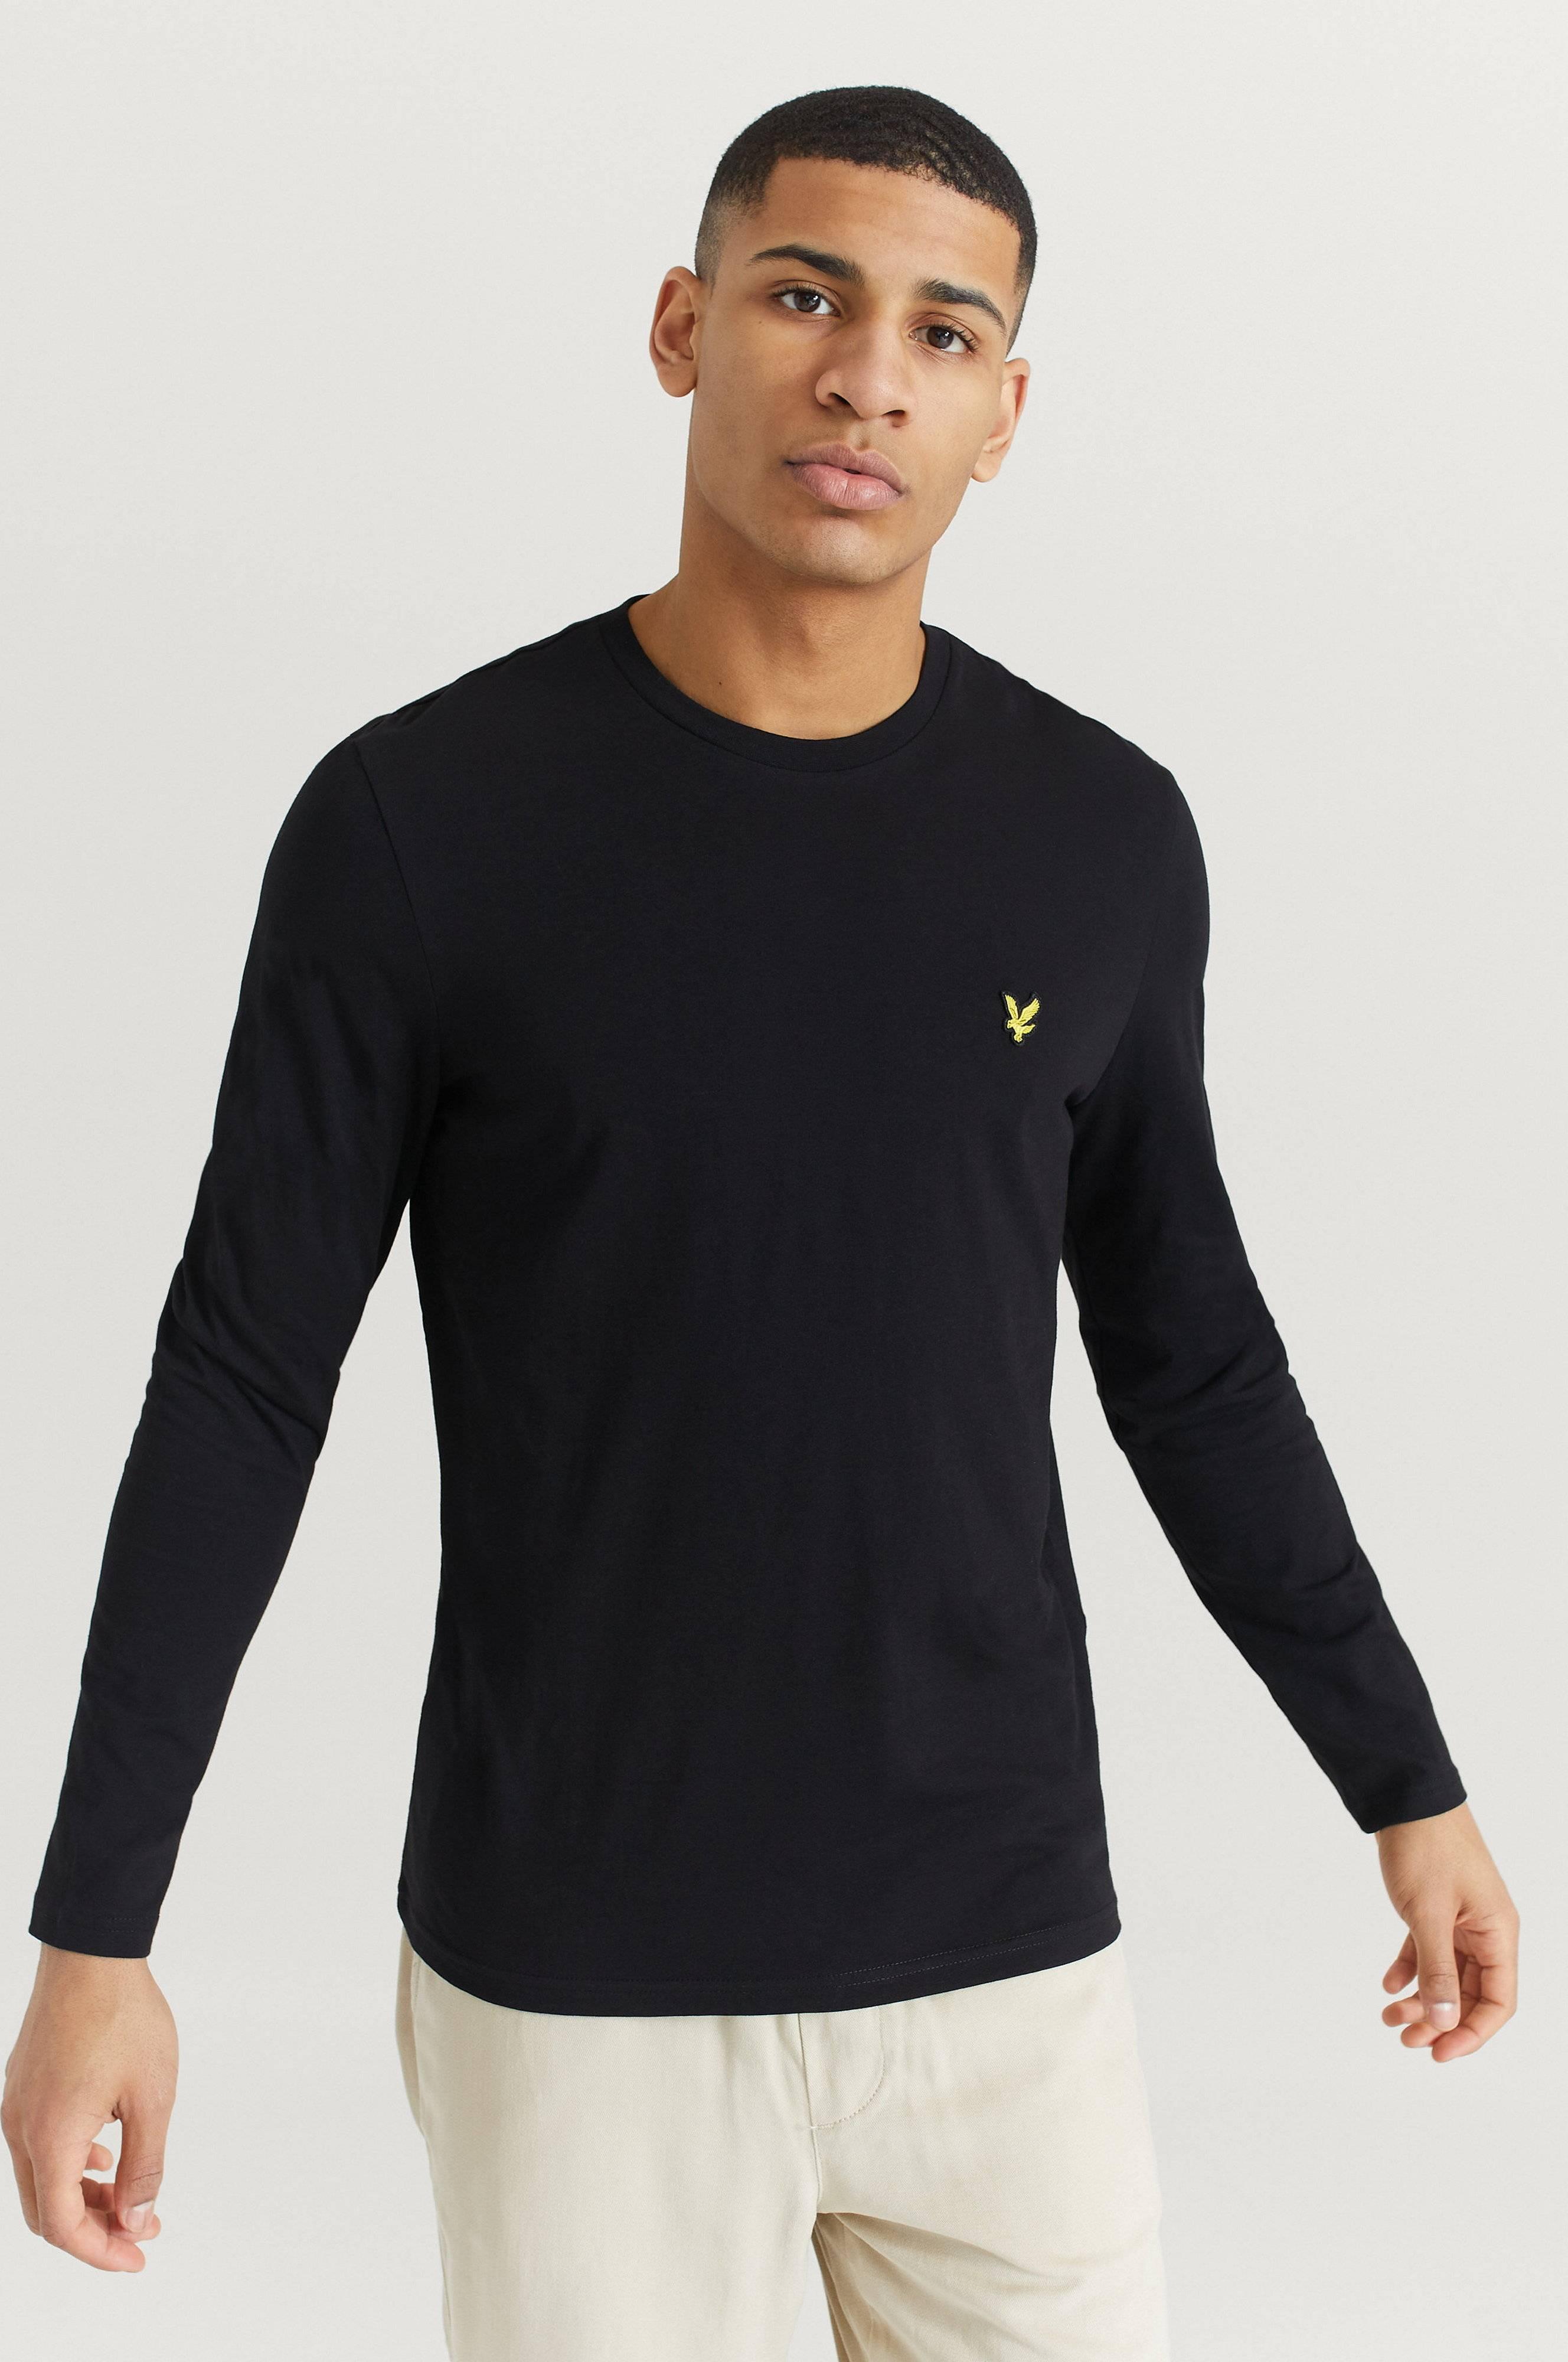 Lyle & Scott LS Crew Neck T-shirt Tröjor Svart